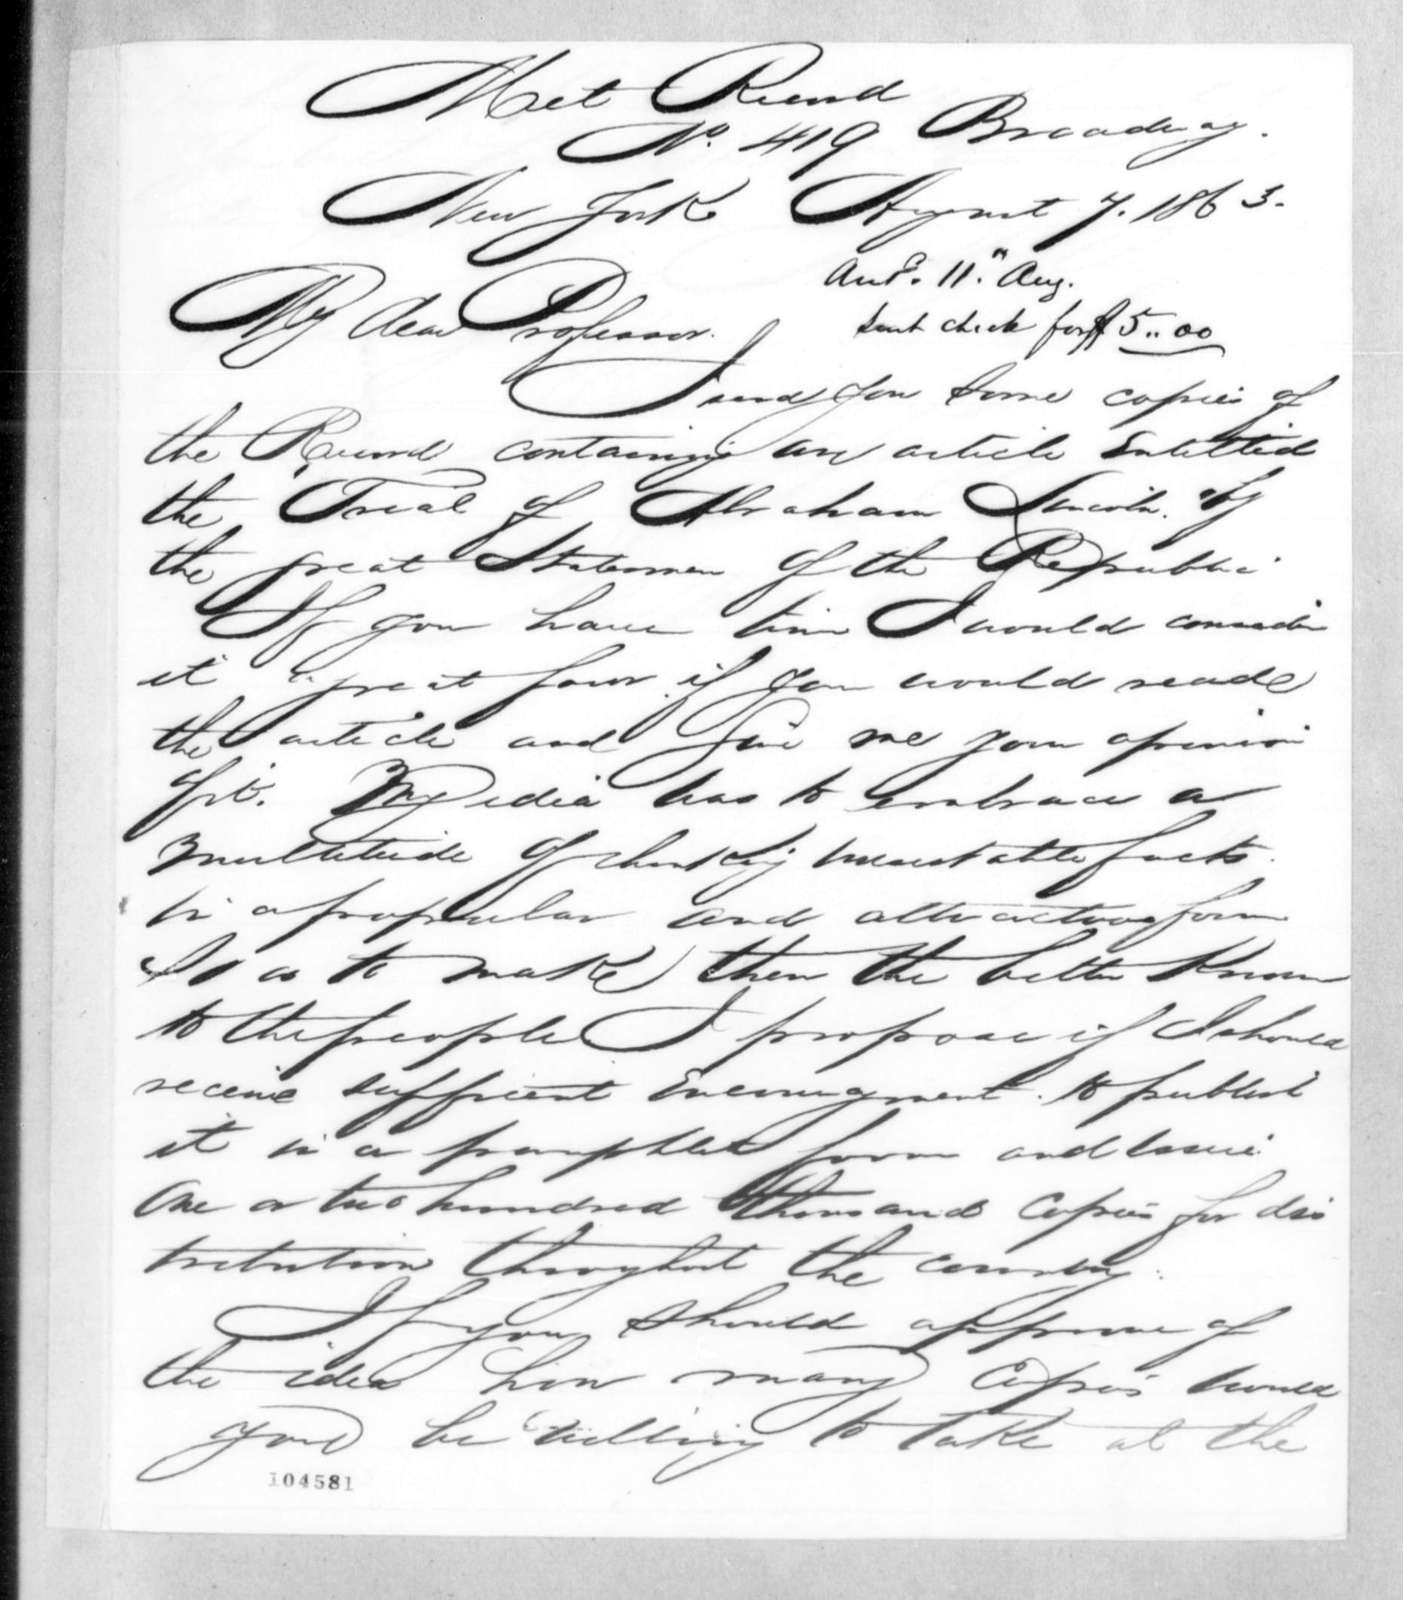 Bound volume---13 July 1862-16 May 1864